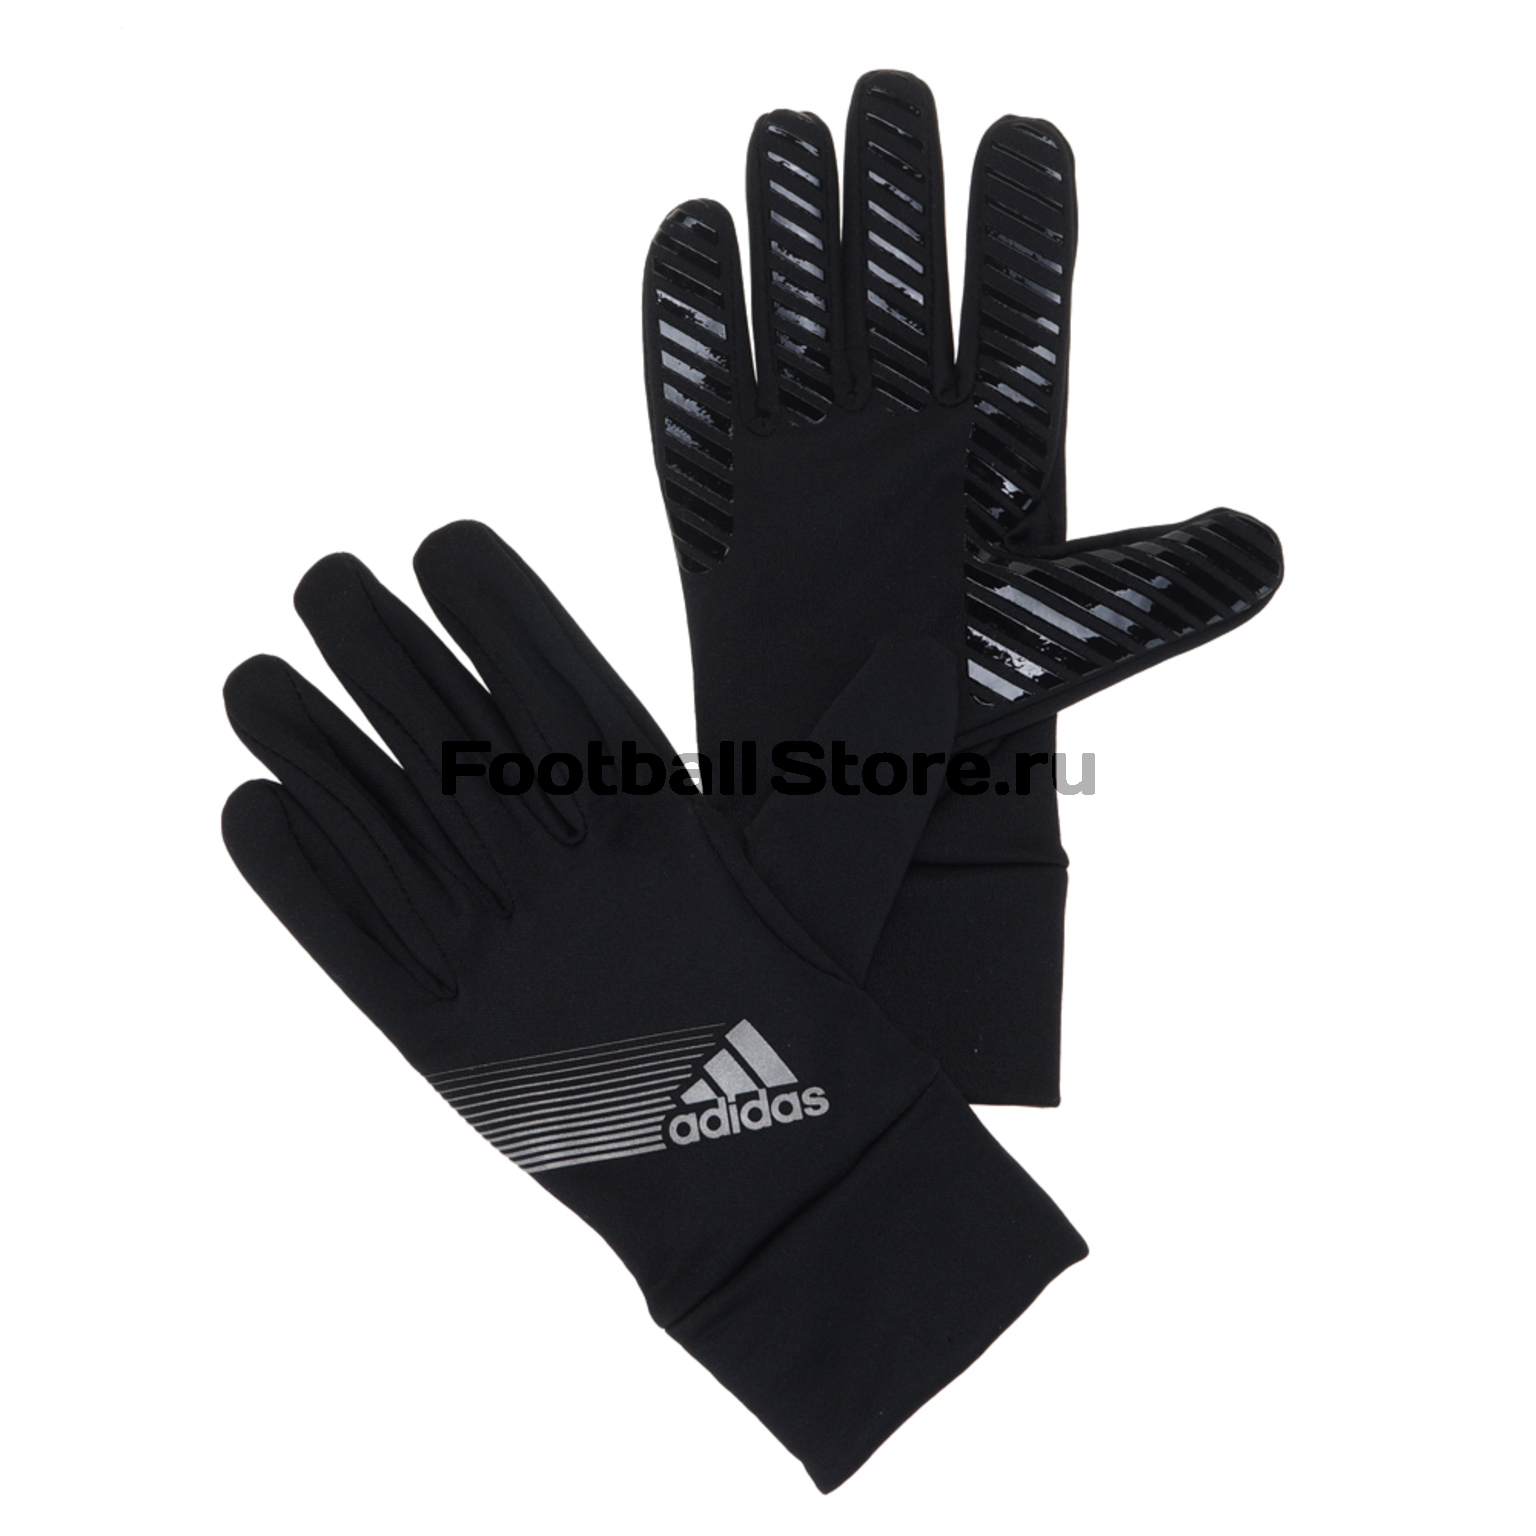 цена на Перчатки тренировочные Adidas Fieldplayer Central Player Gloves W44097